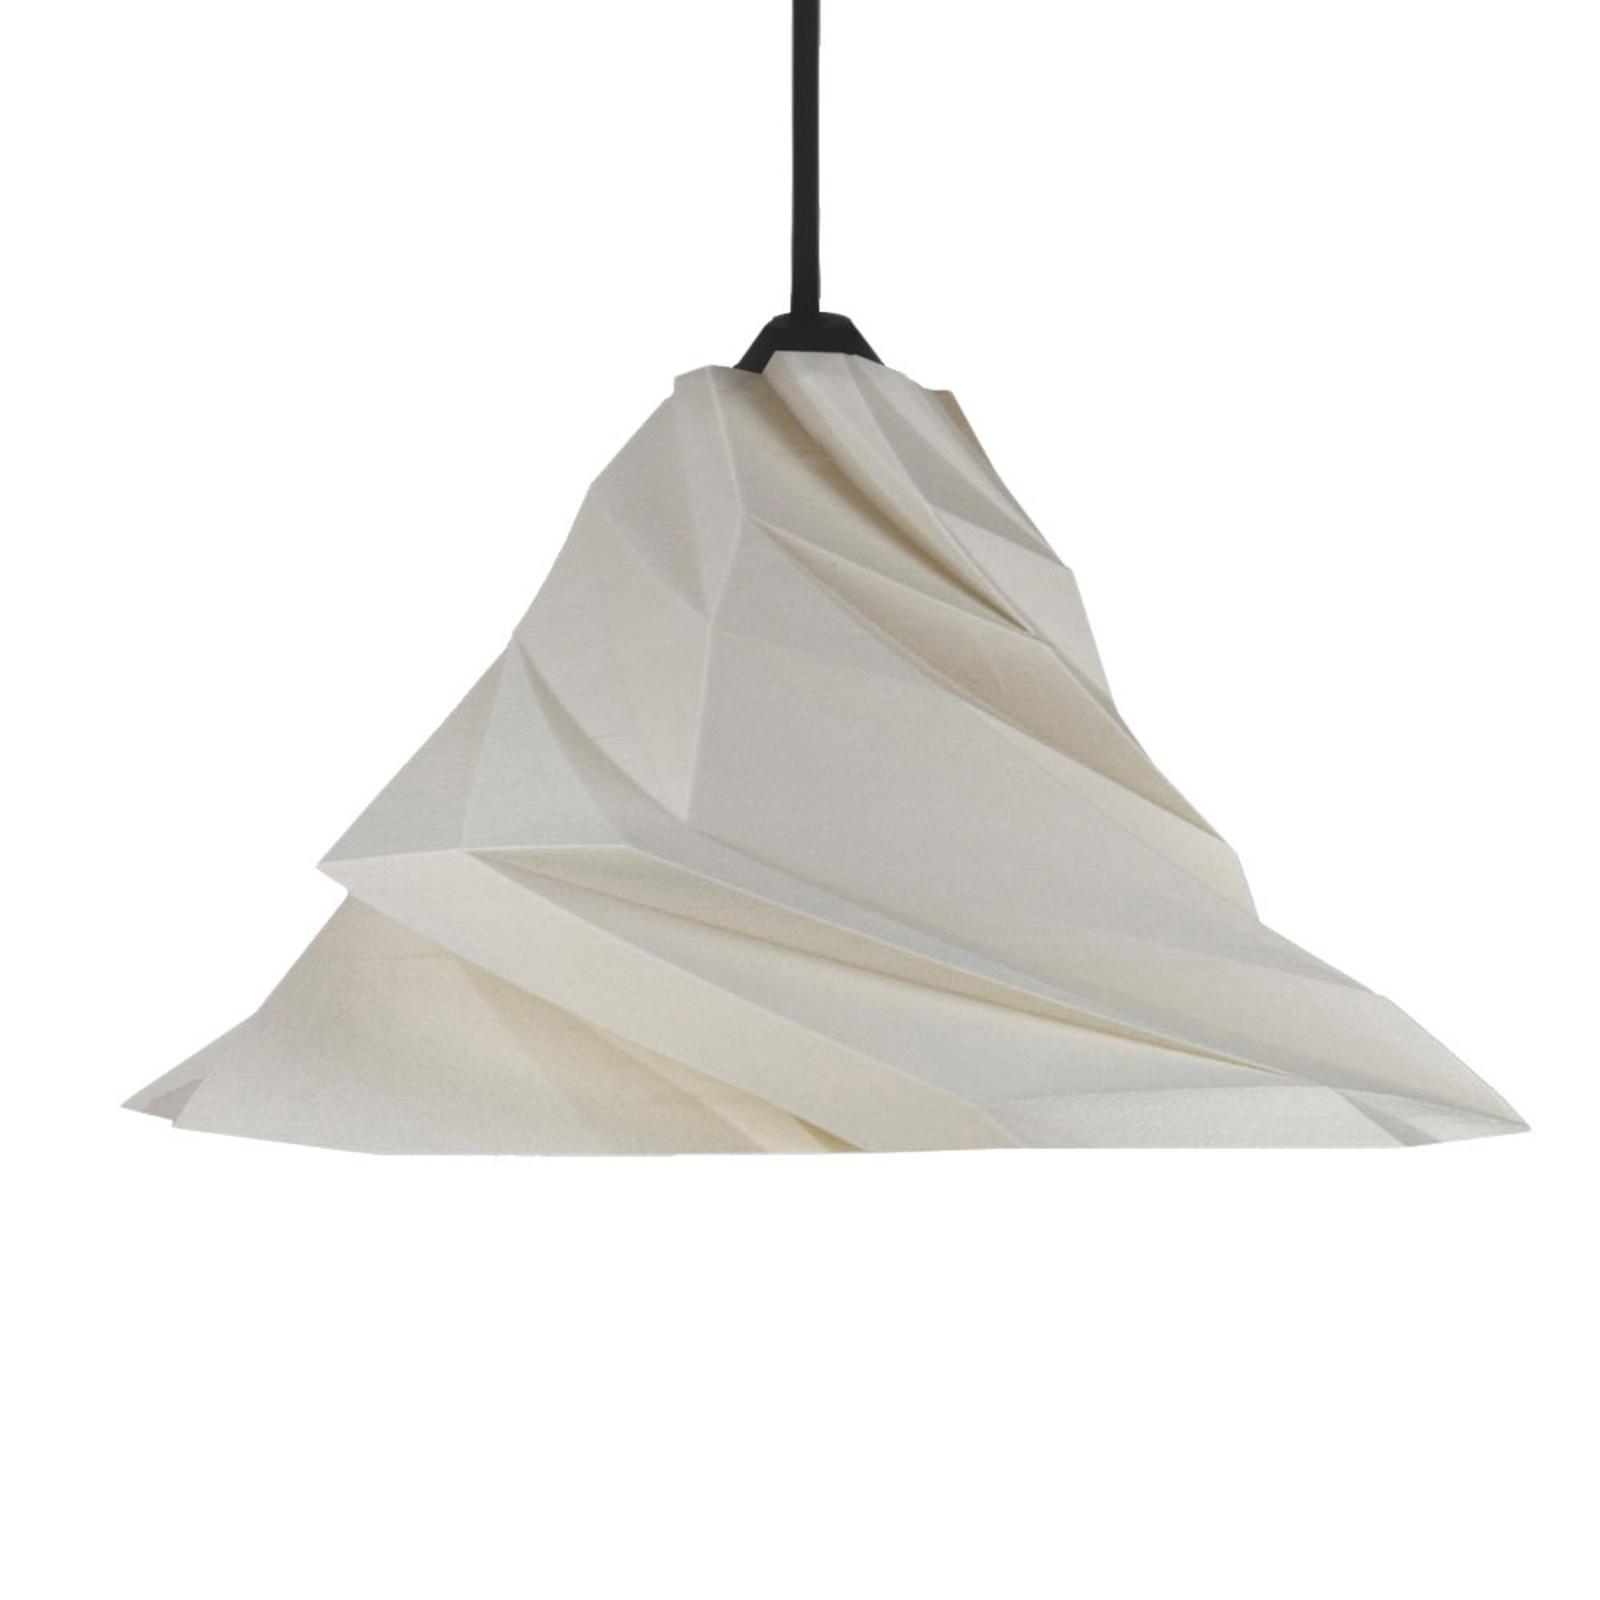 Twister hængelampe, beige